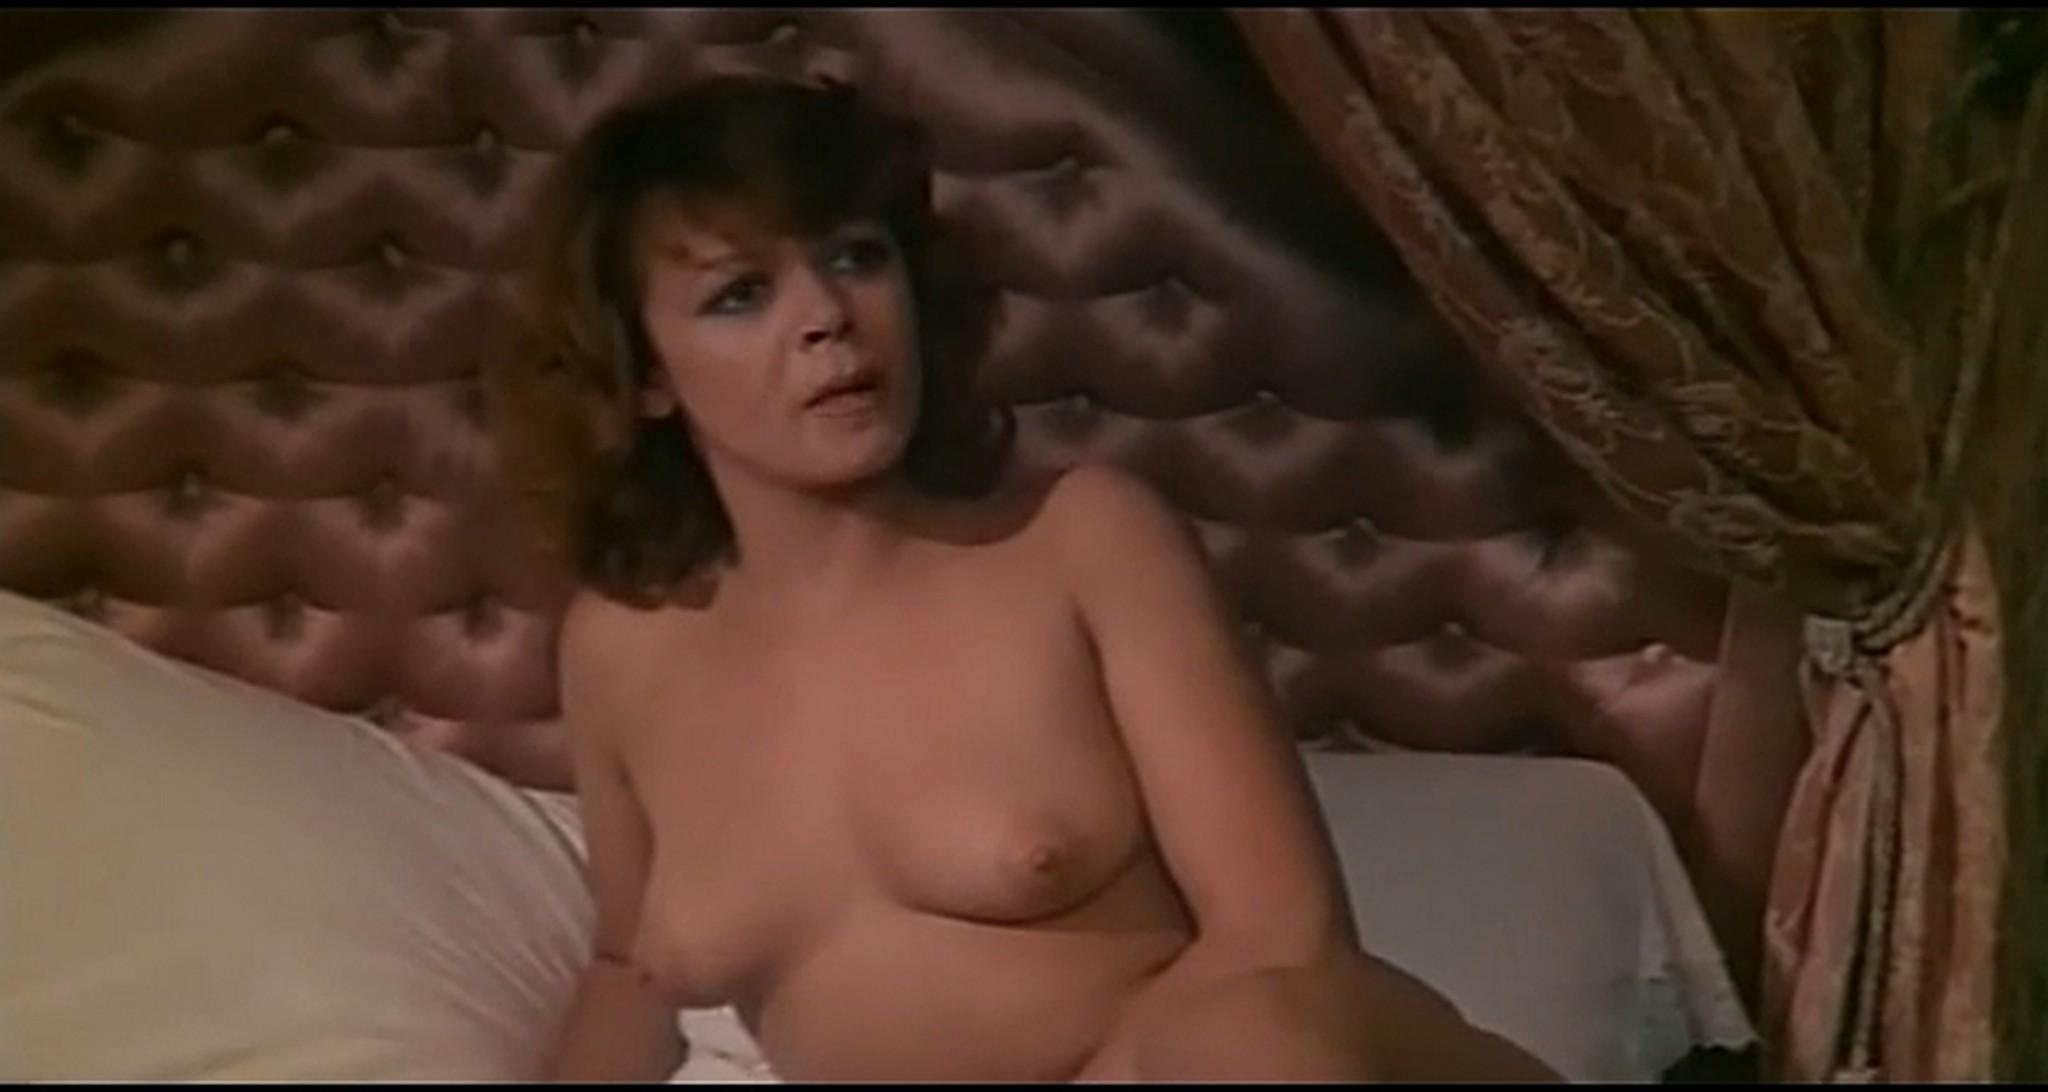 Gloria Guida nude full frontal Marilda Dona nude too L affittacamere IT 1976 DVDRip 16